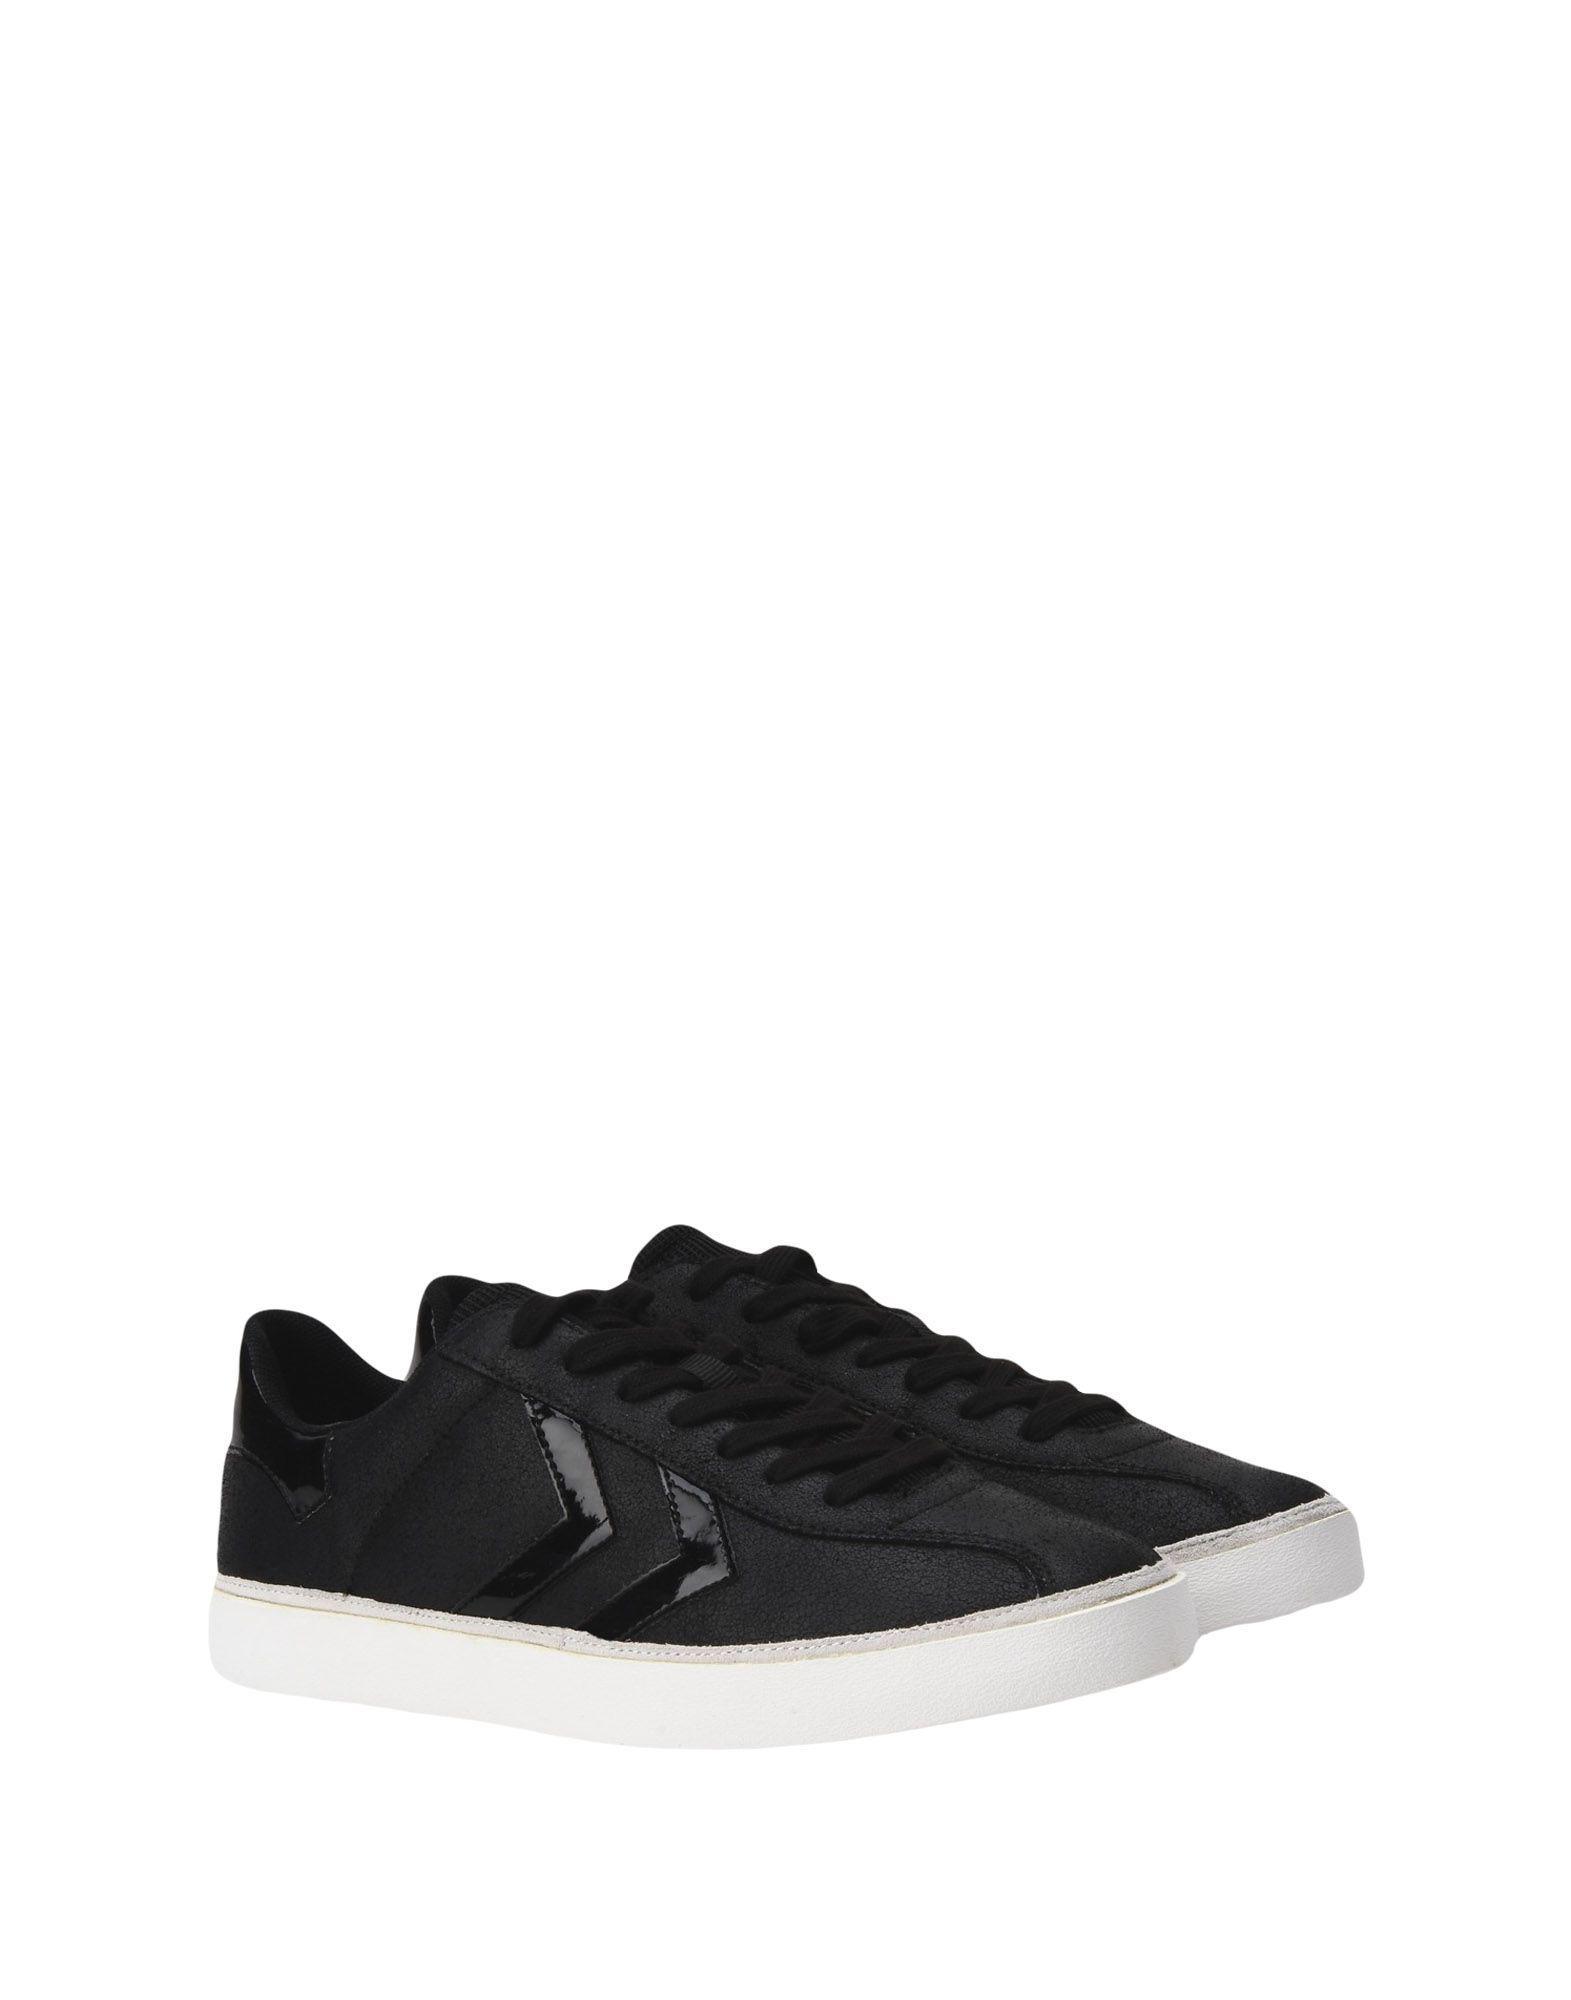 Hummel Leather Low-tops & Sneakers in Black